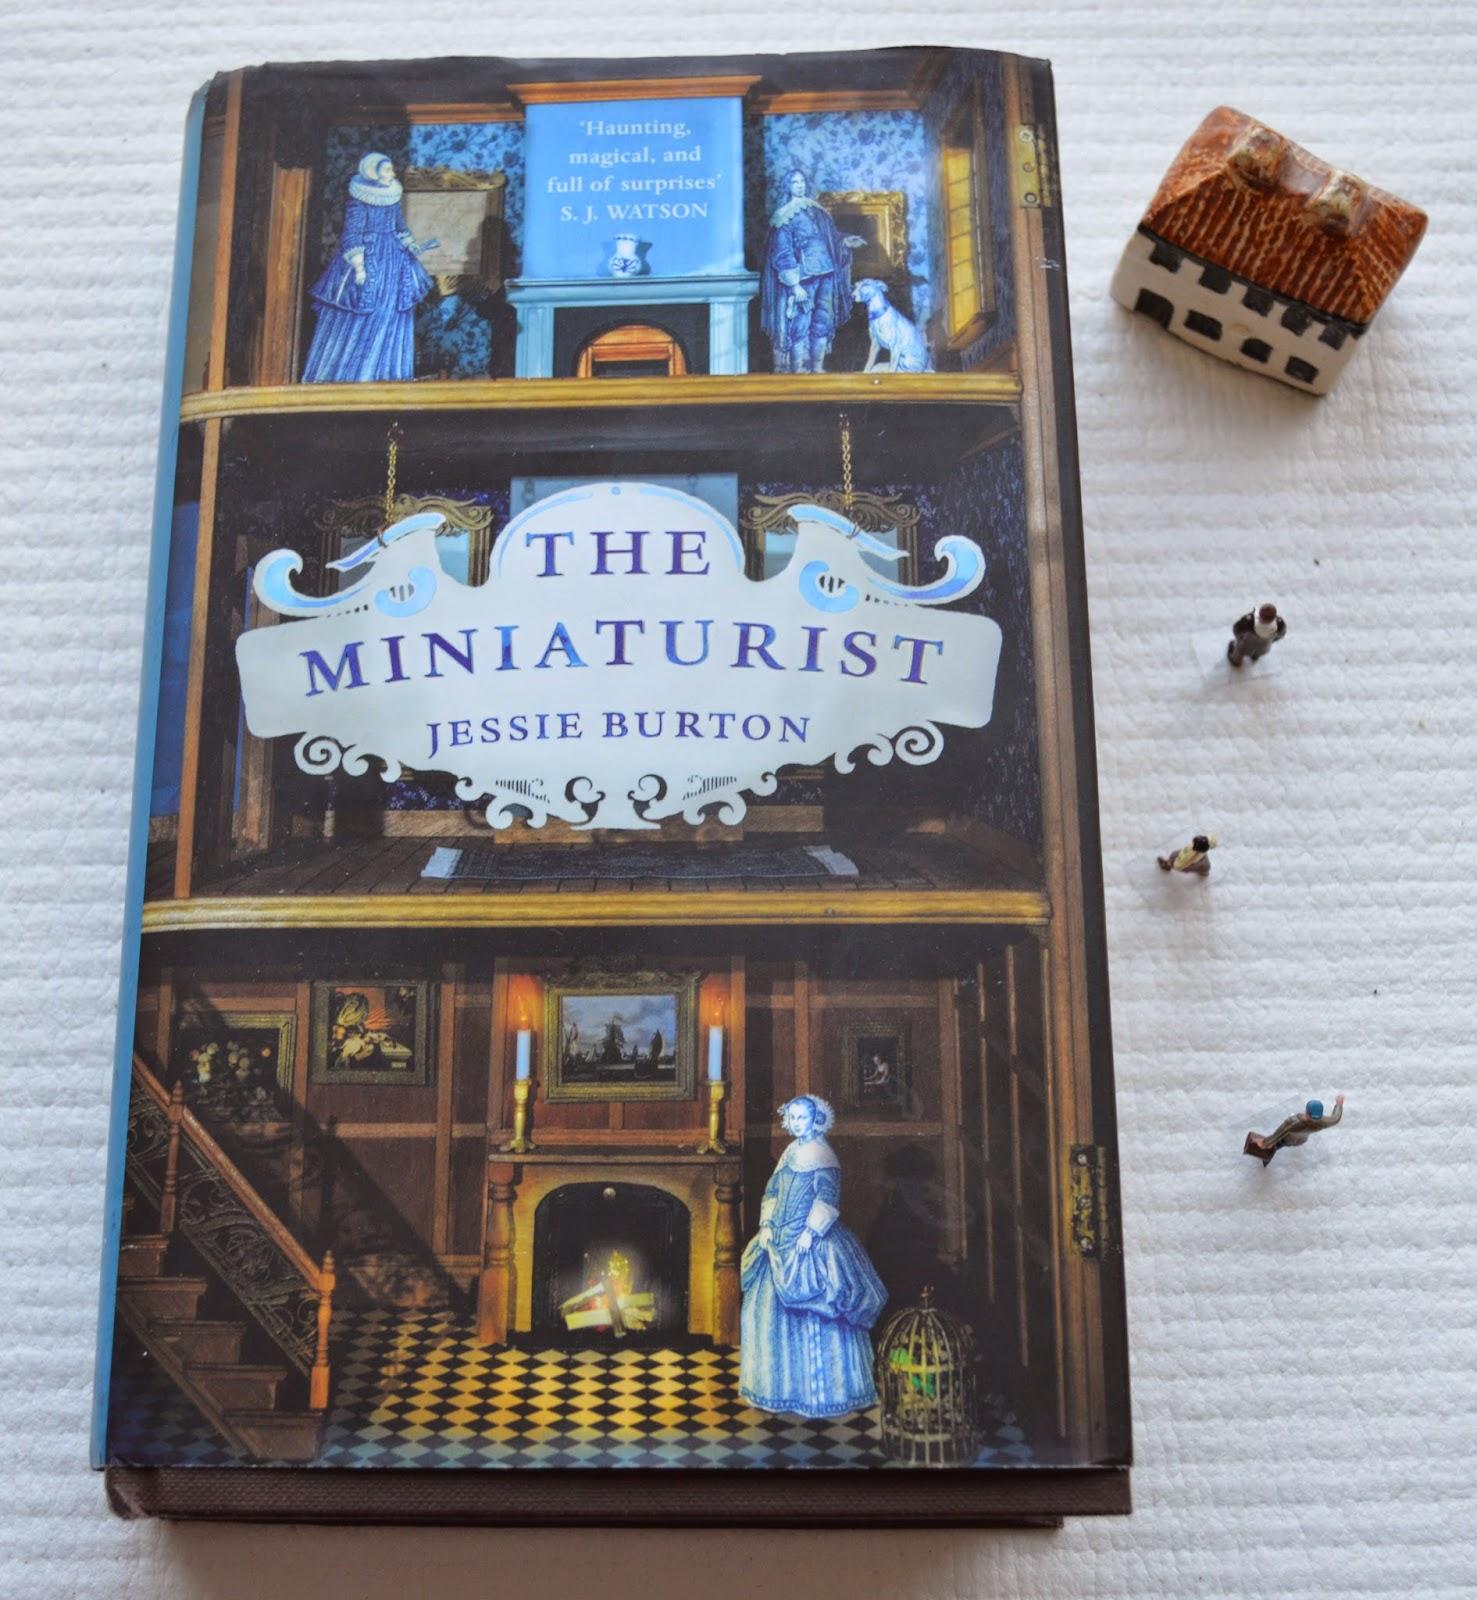 The Miniaturist, Jessie Burton, book review, Holland, blog, literature, book cover, sugar trade, Nella Oortman, Johannes, gay, historical fiction, Dutch East India Company, slavery